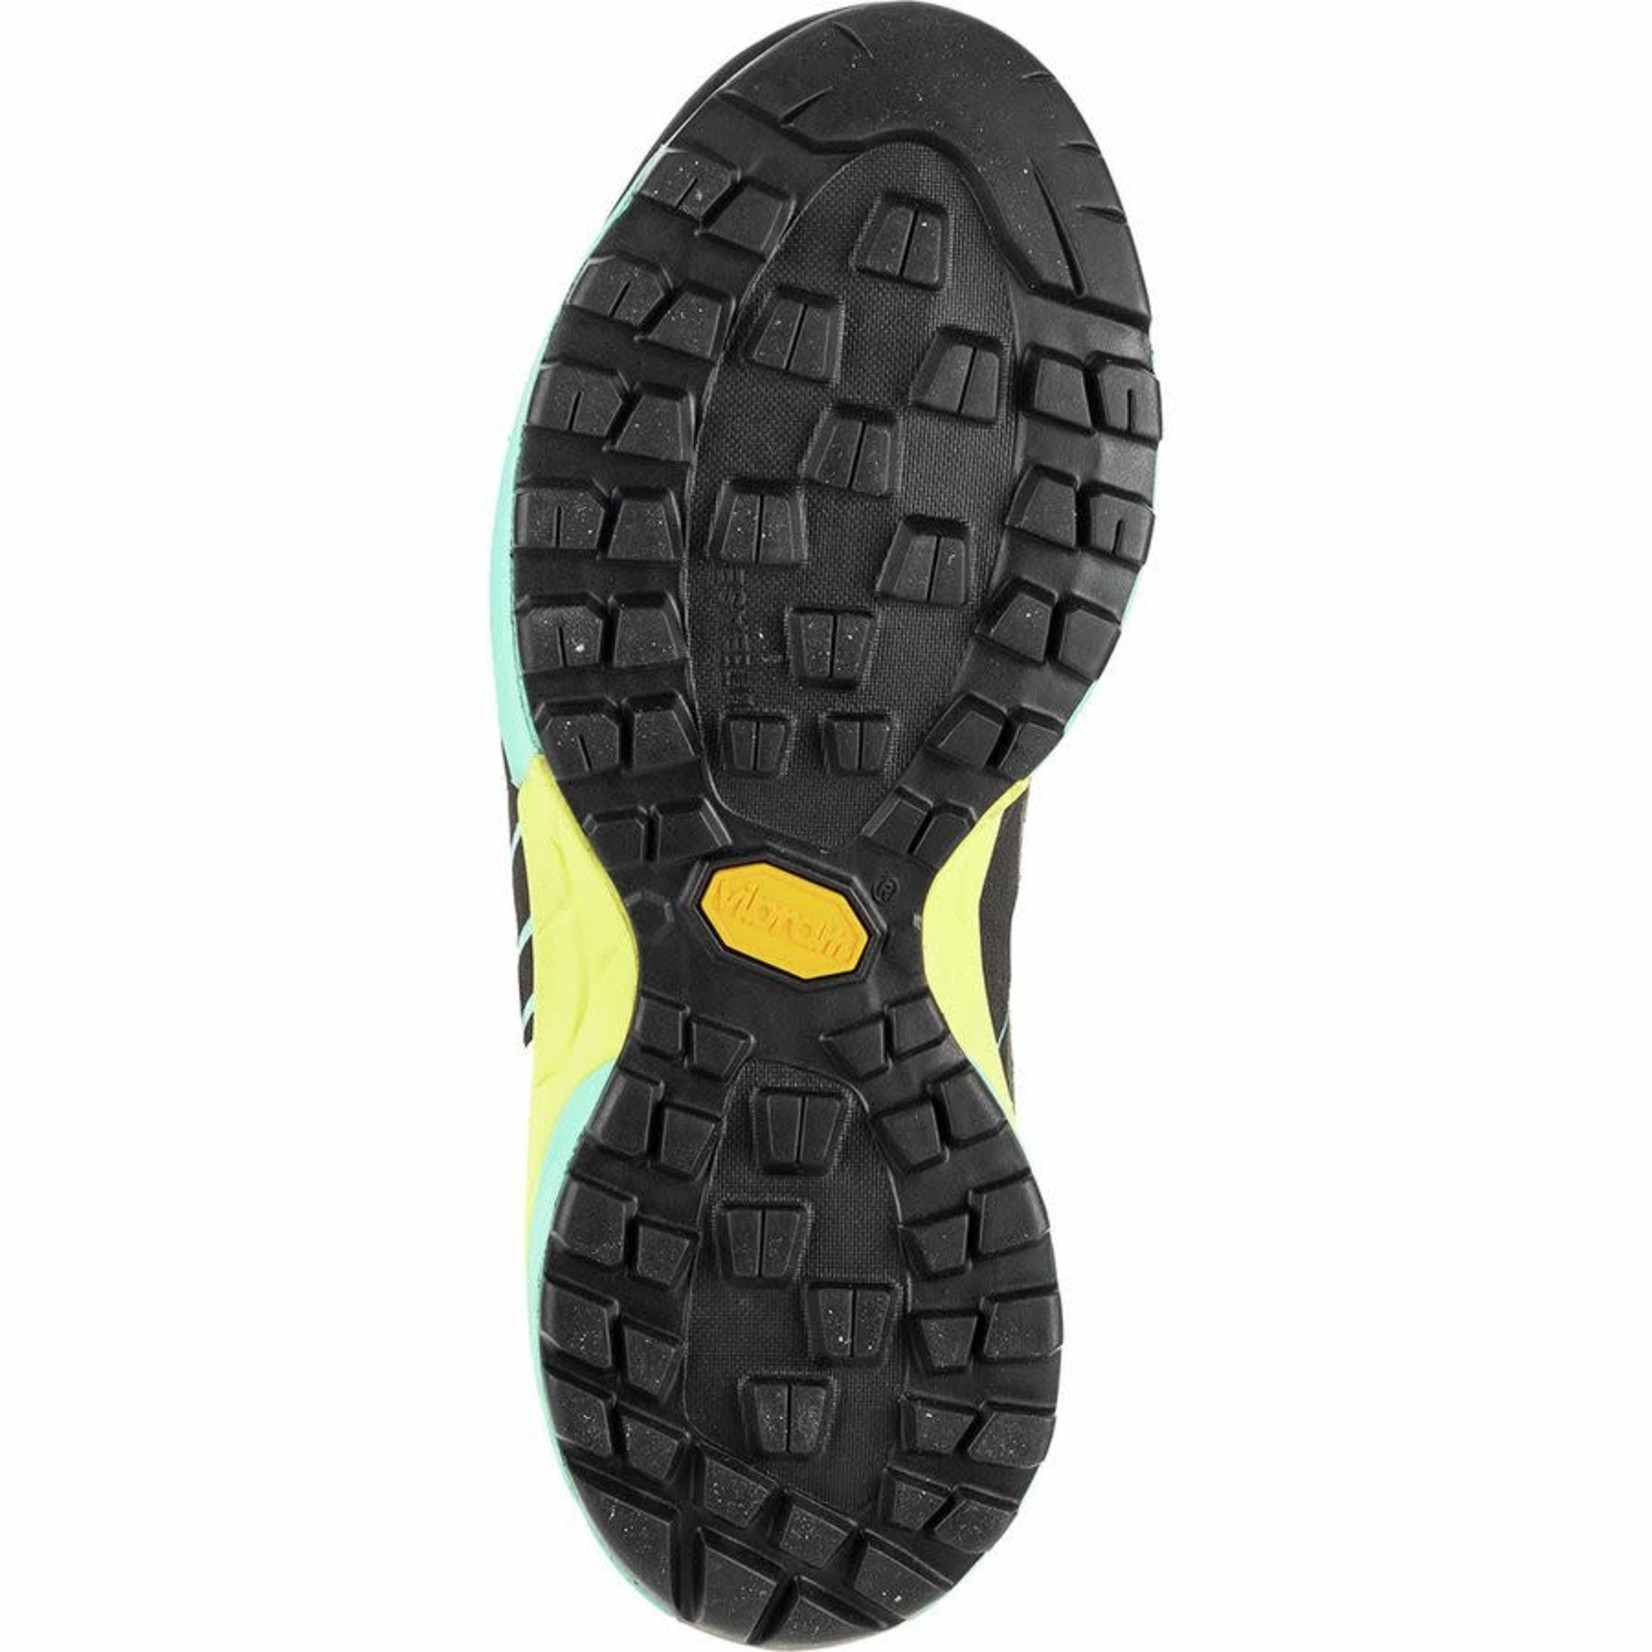 Scarpa Scarpa Mescalito Approach Shoe - Women